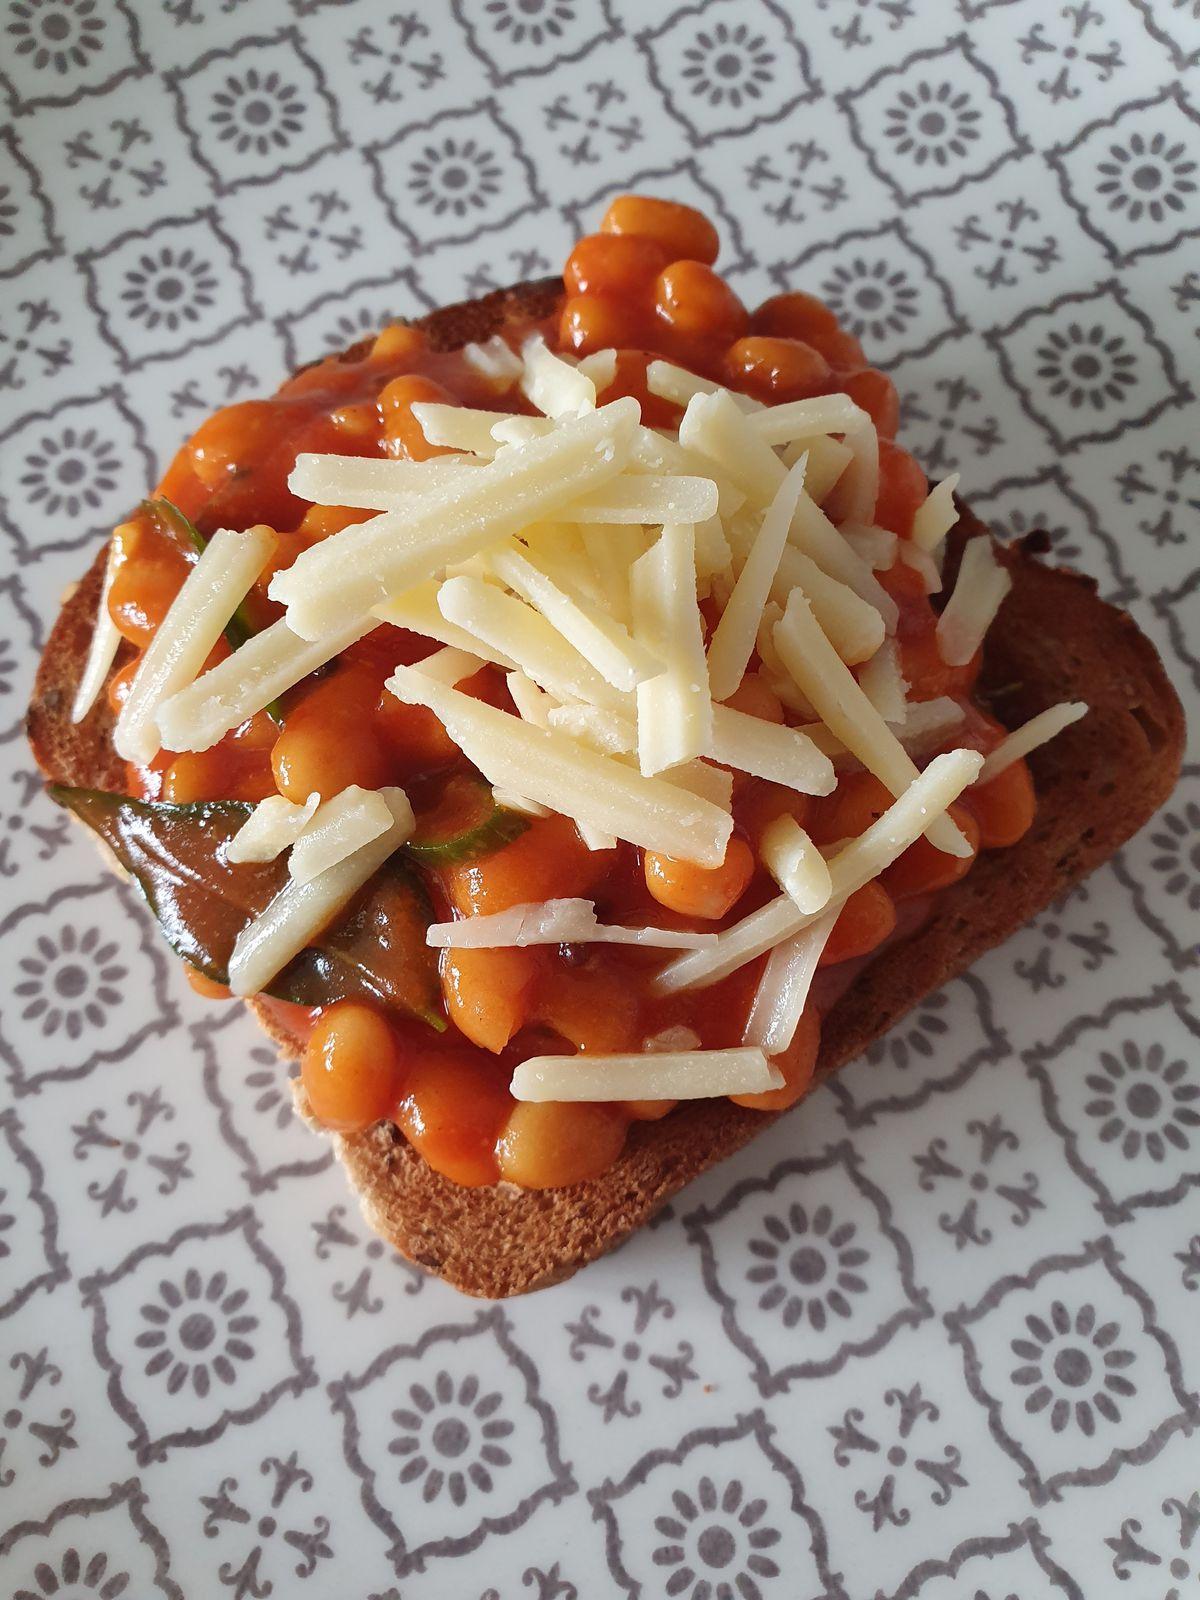 Masala beans on toast by Hoppers' Karan Gokani